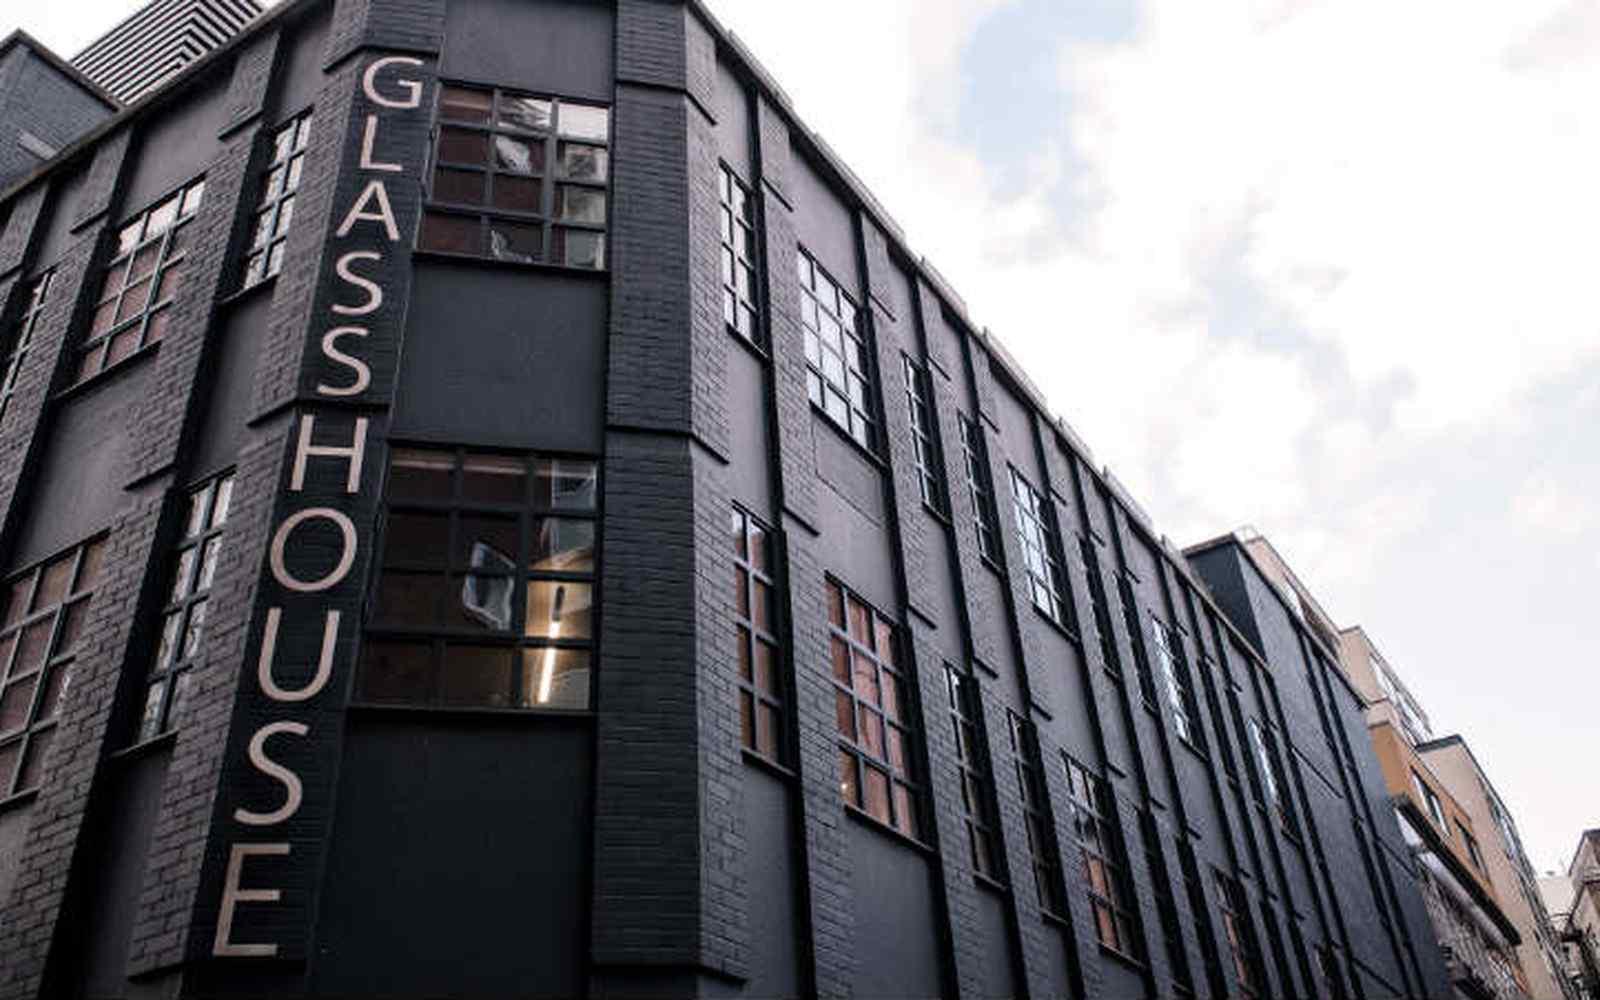 External shot of Glasshouse Yard